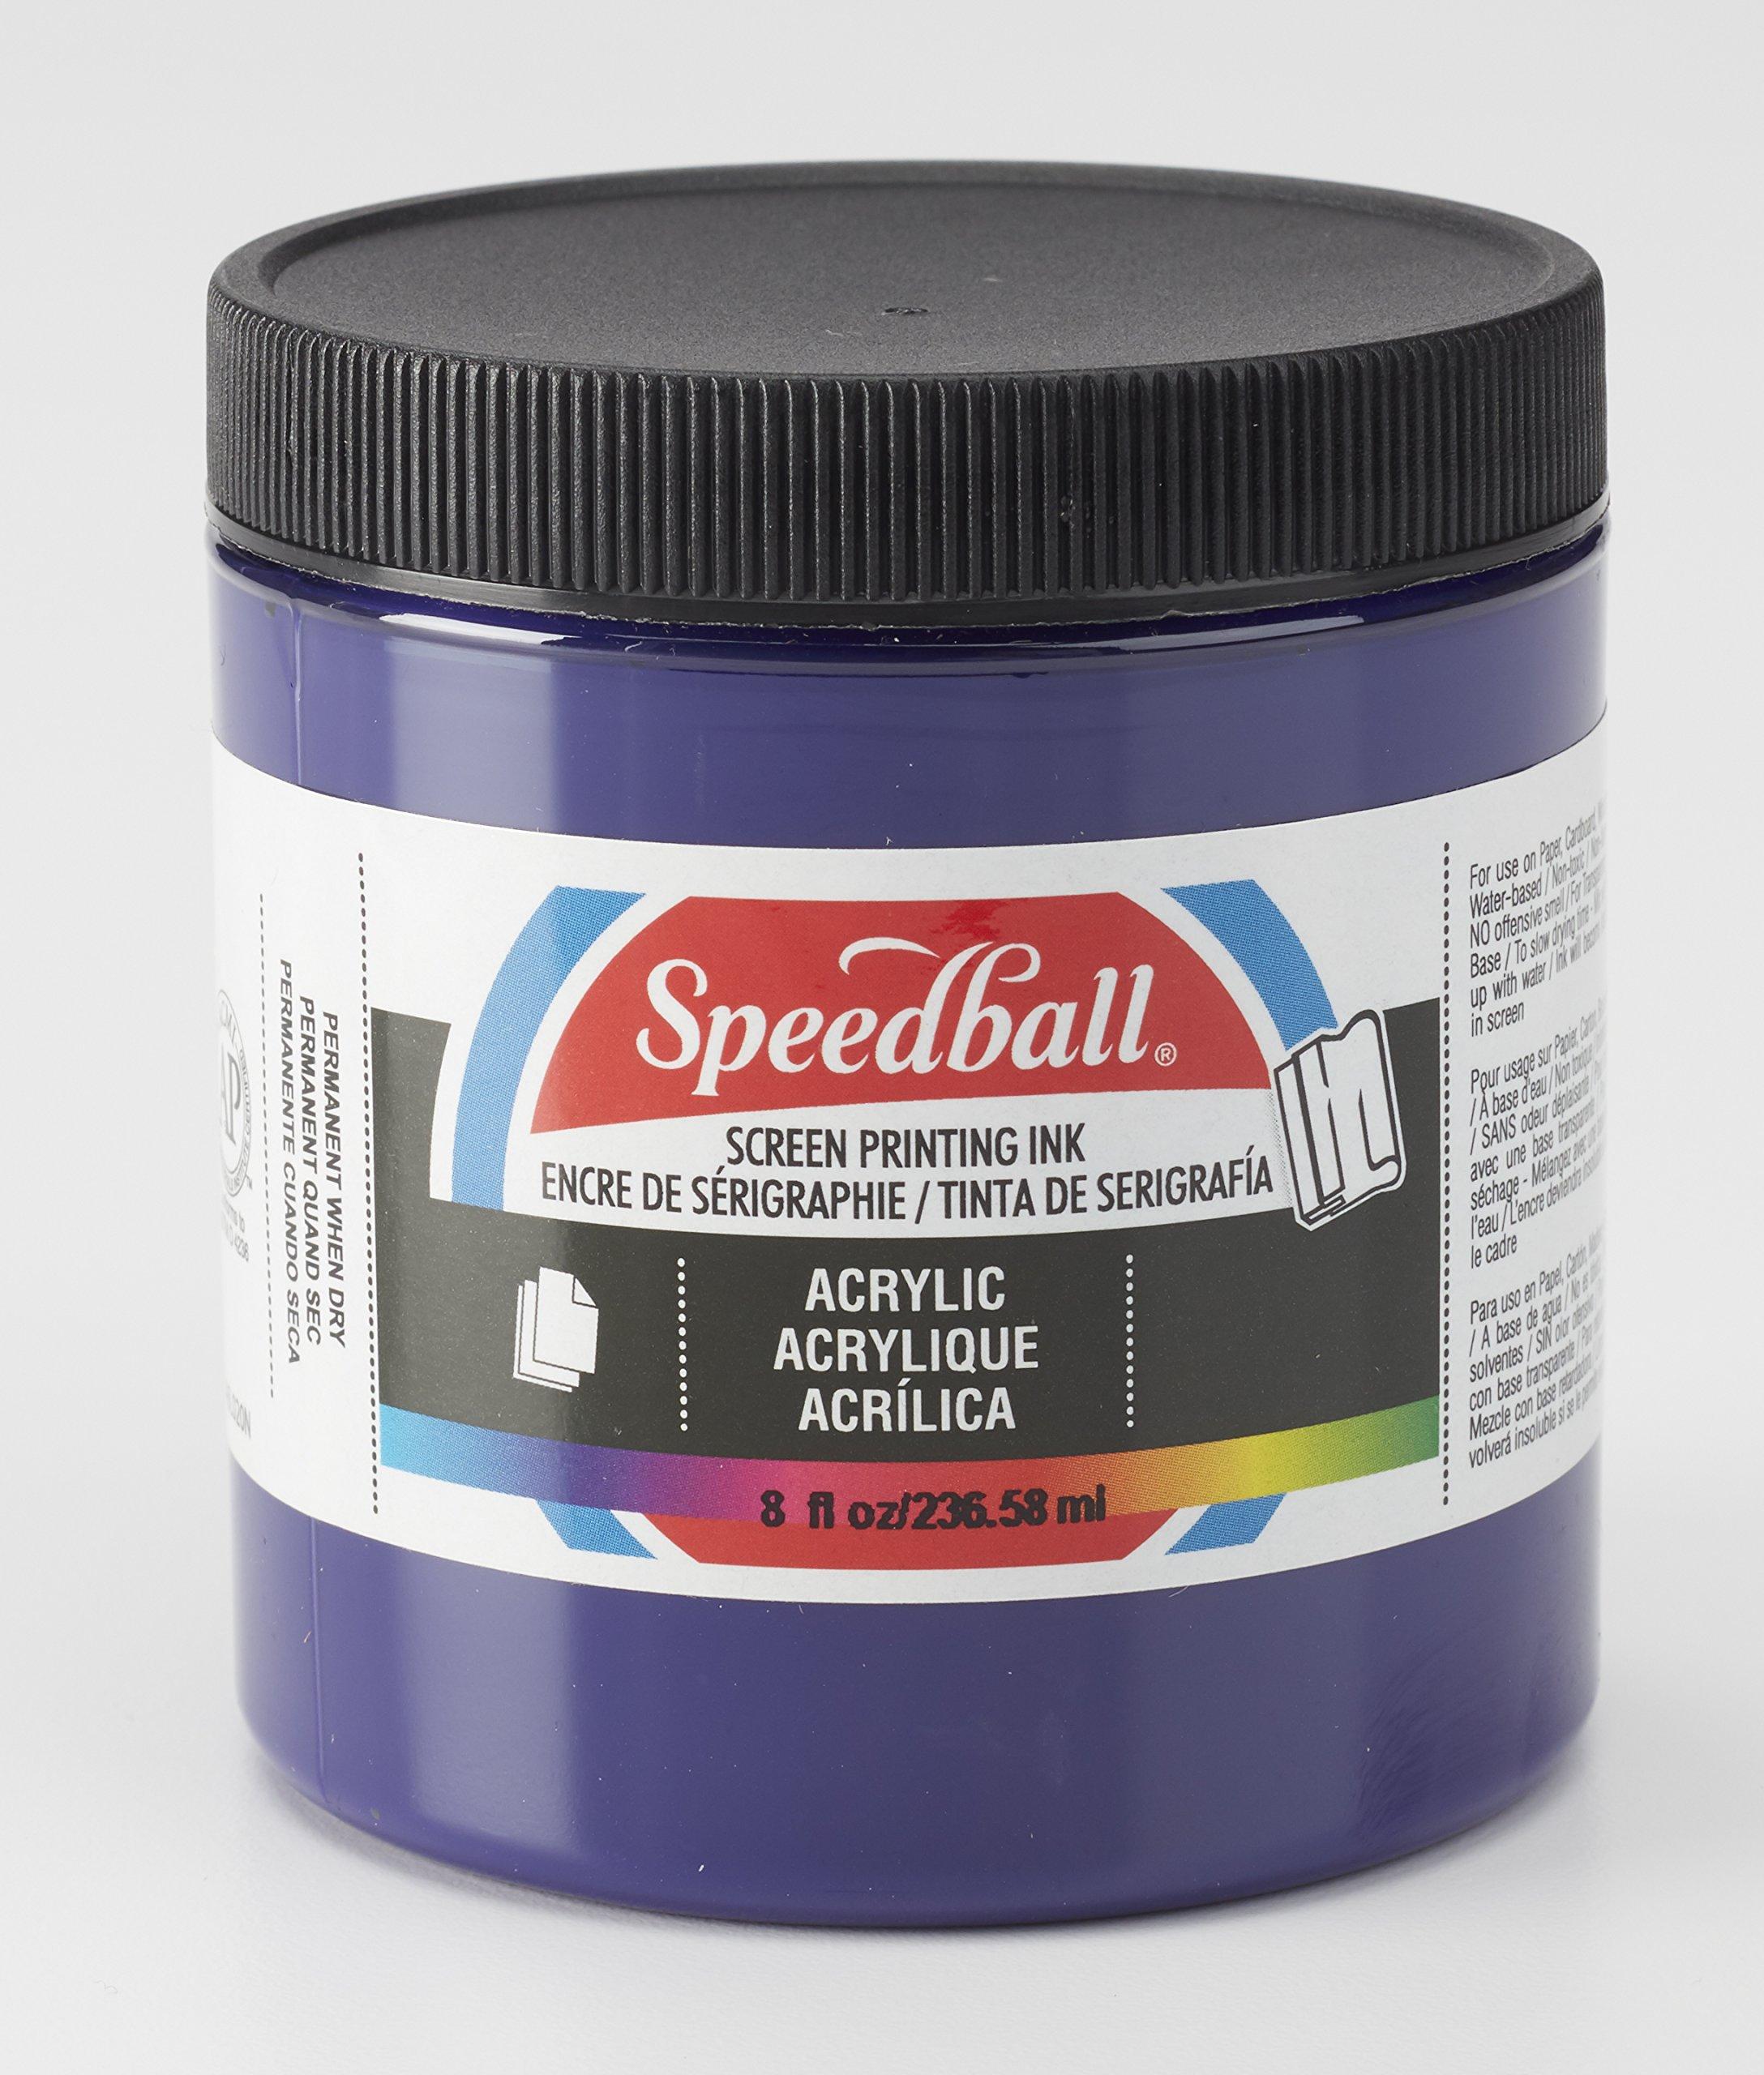 Speedball 004630 Acrylic Screen Printing Ink, 237ml, 8 Fl. oz, Violet